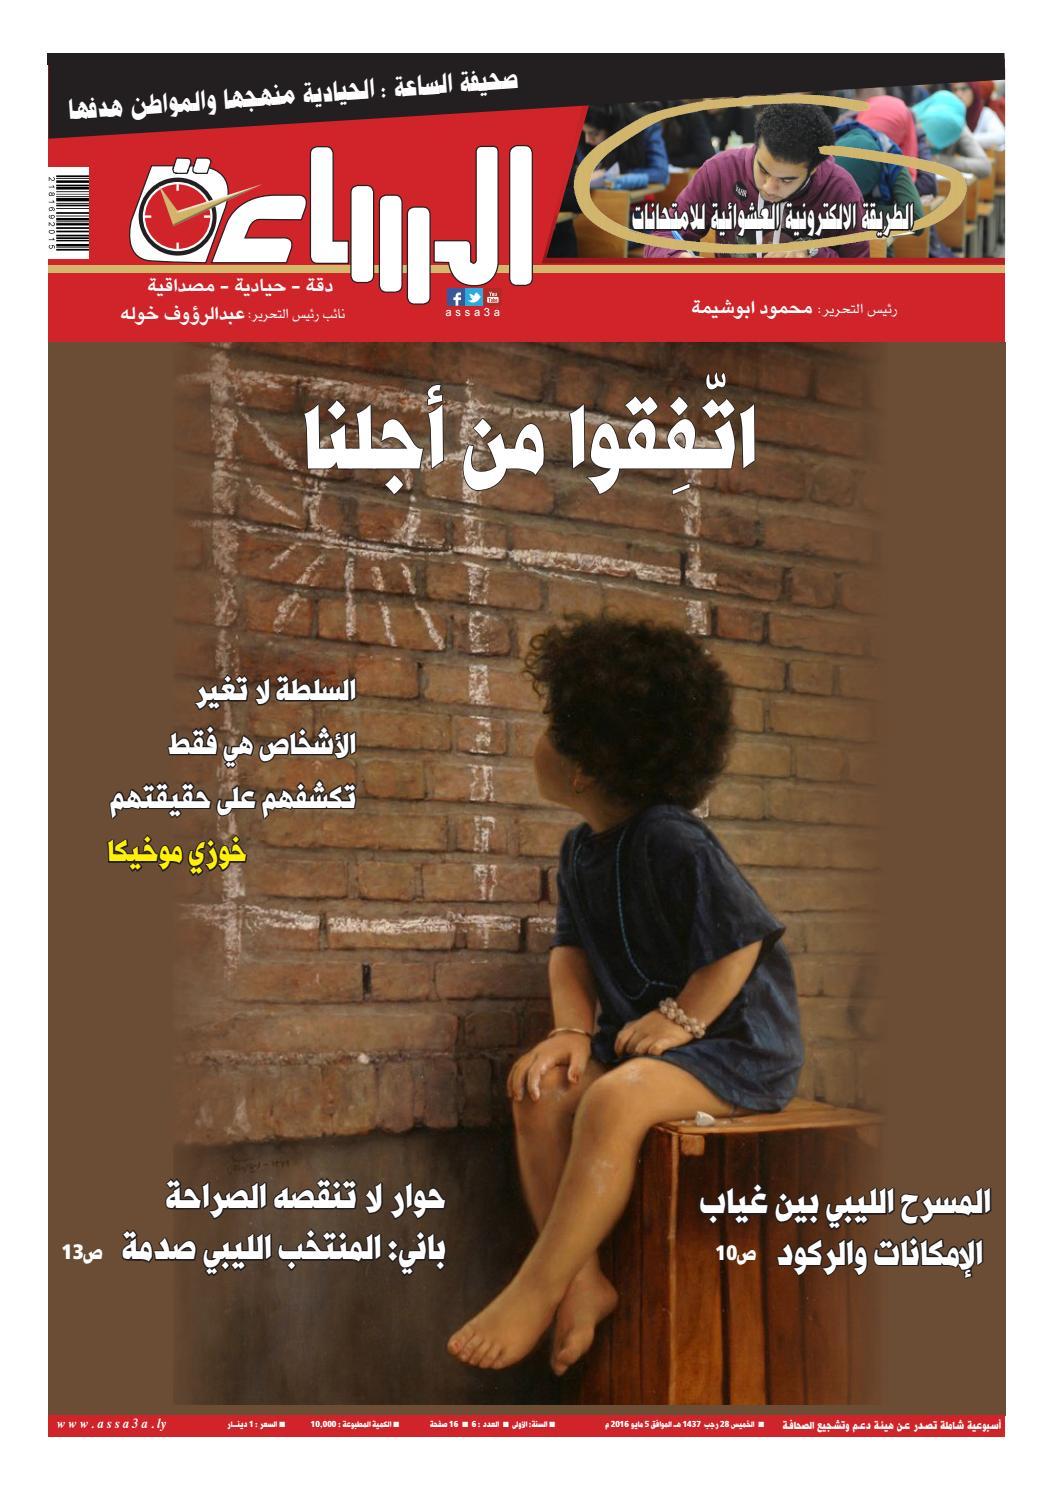 f24f85700 صحيفة الساعة السنة الاولي العدد 6 by هيئة دعم وتشجيع الصحافة - issuu